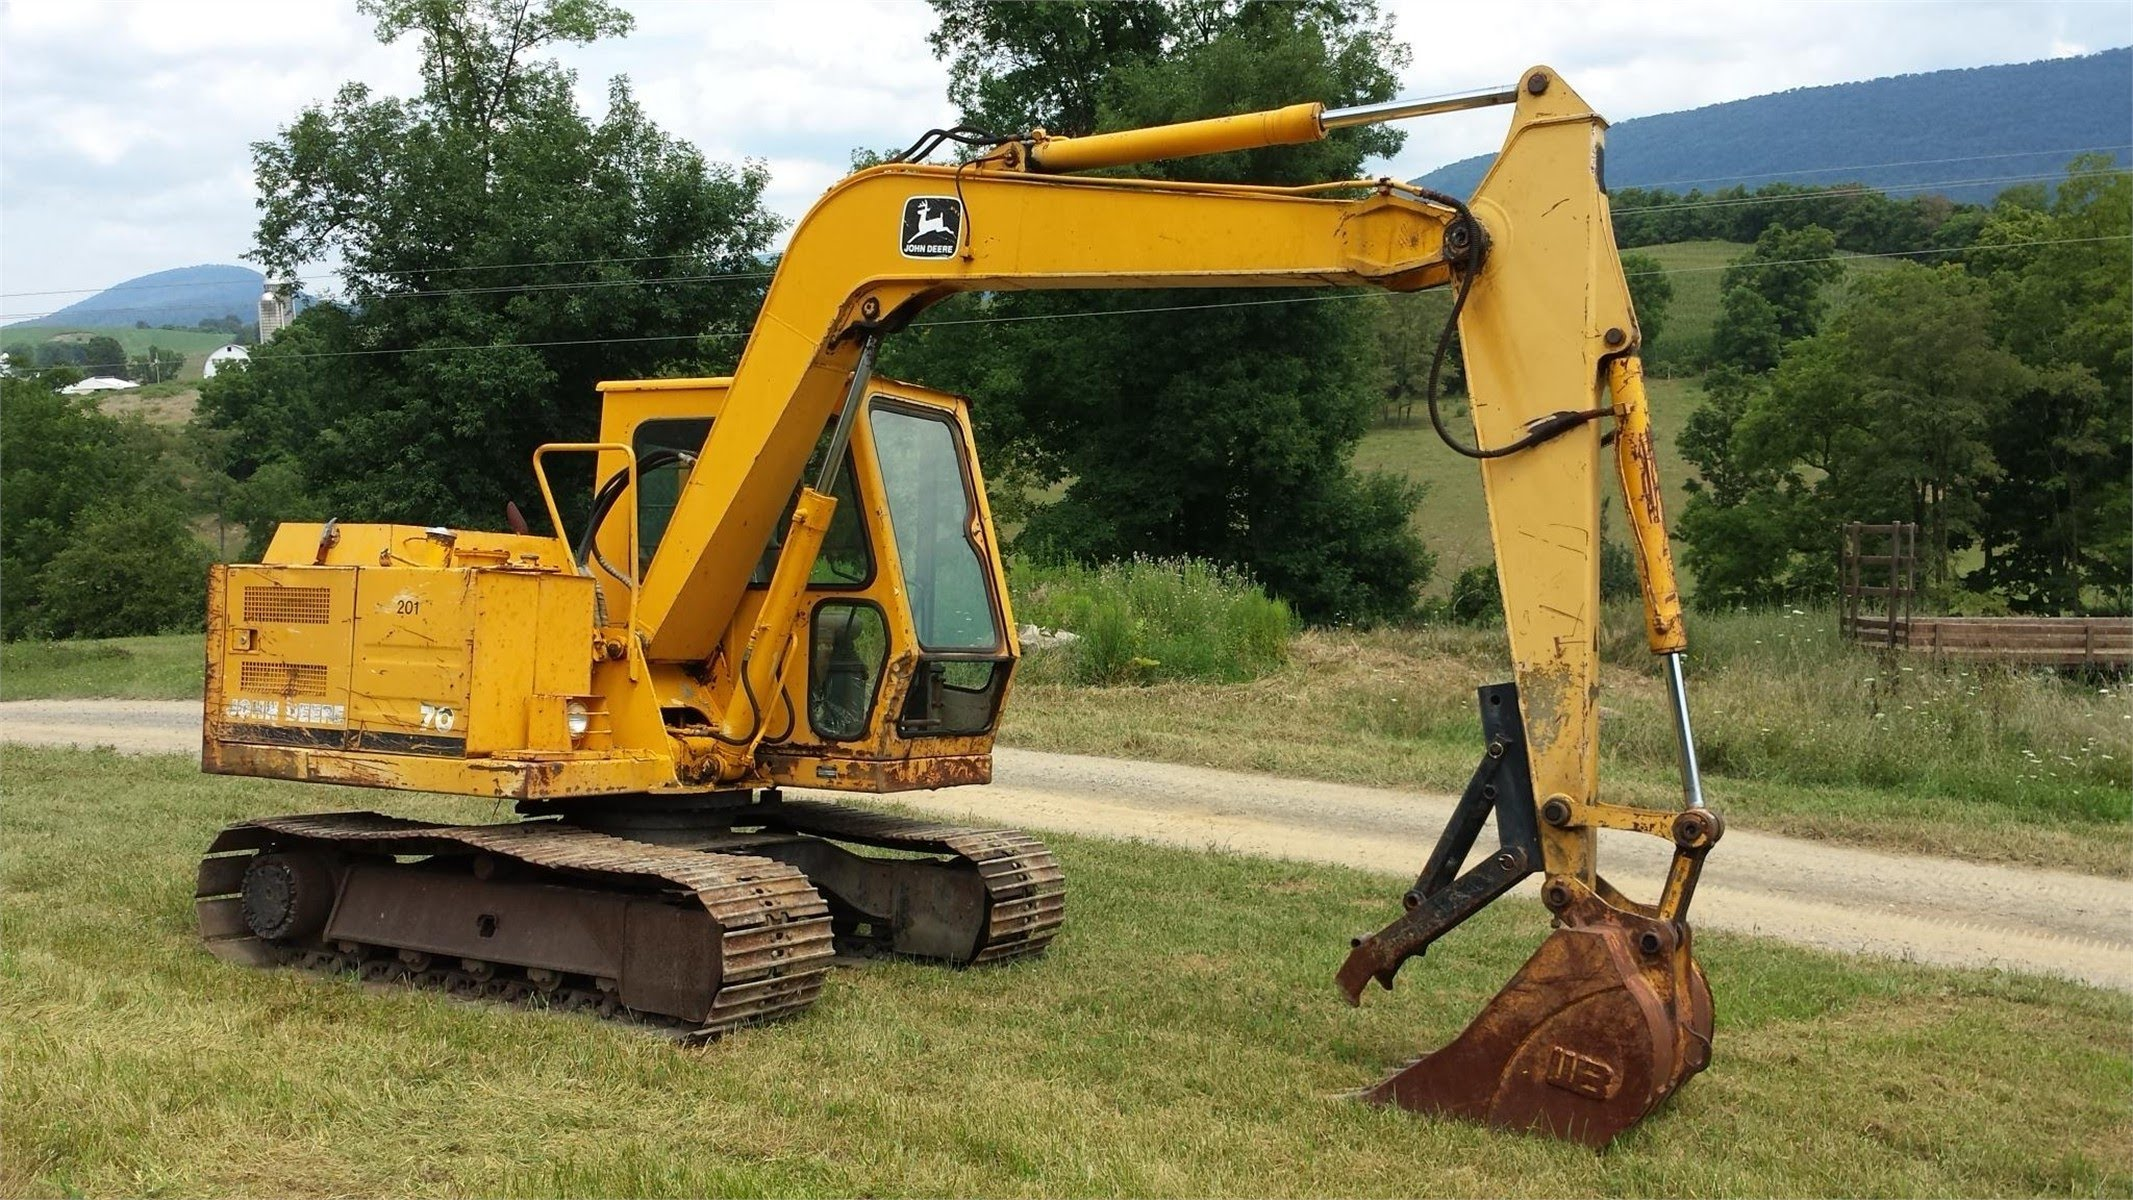 John Deere 70 midi excavator - YouTube